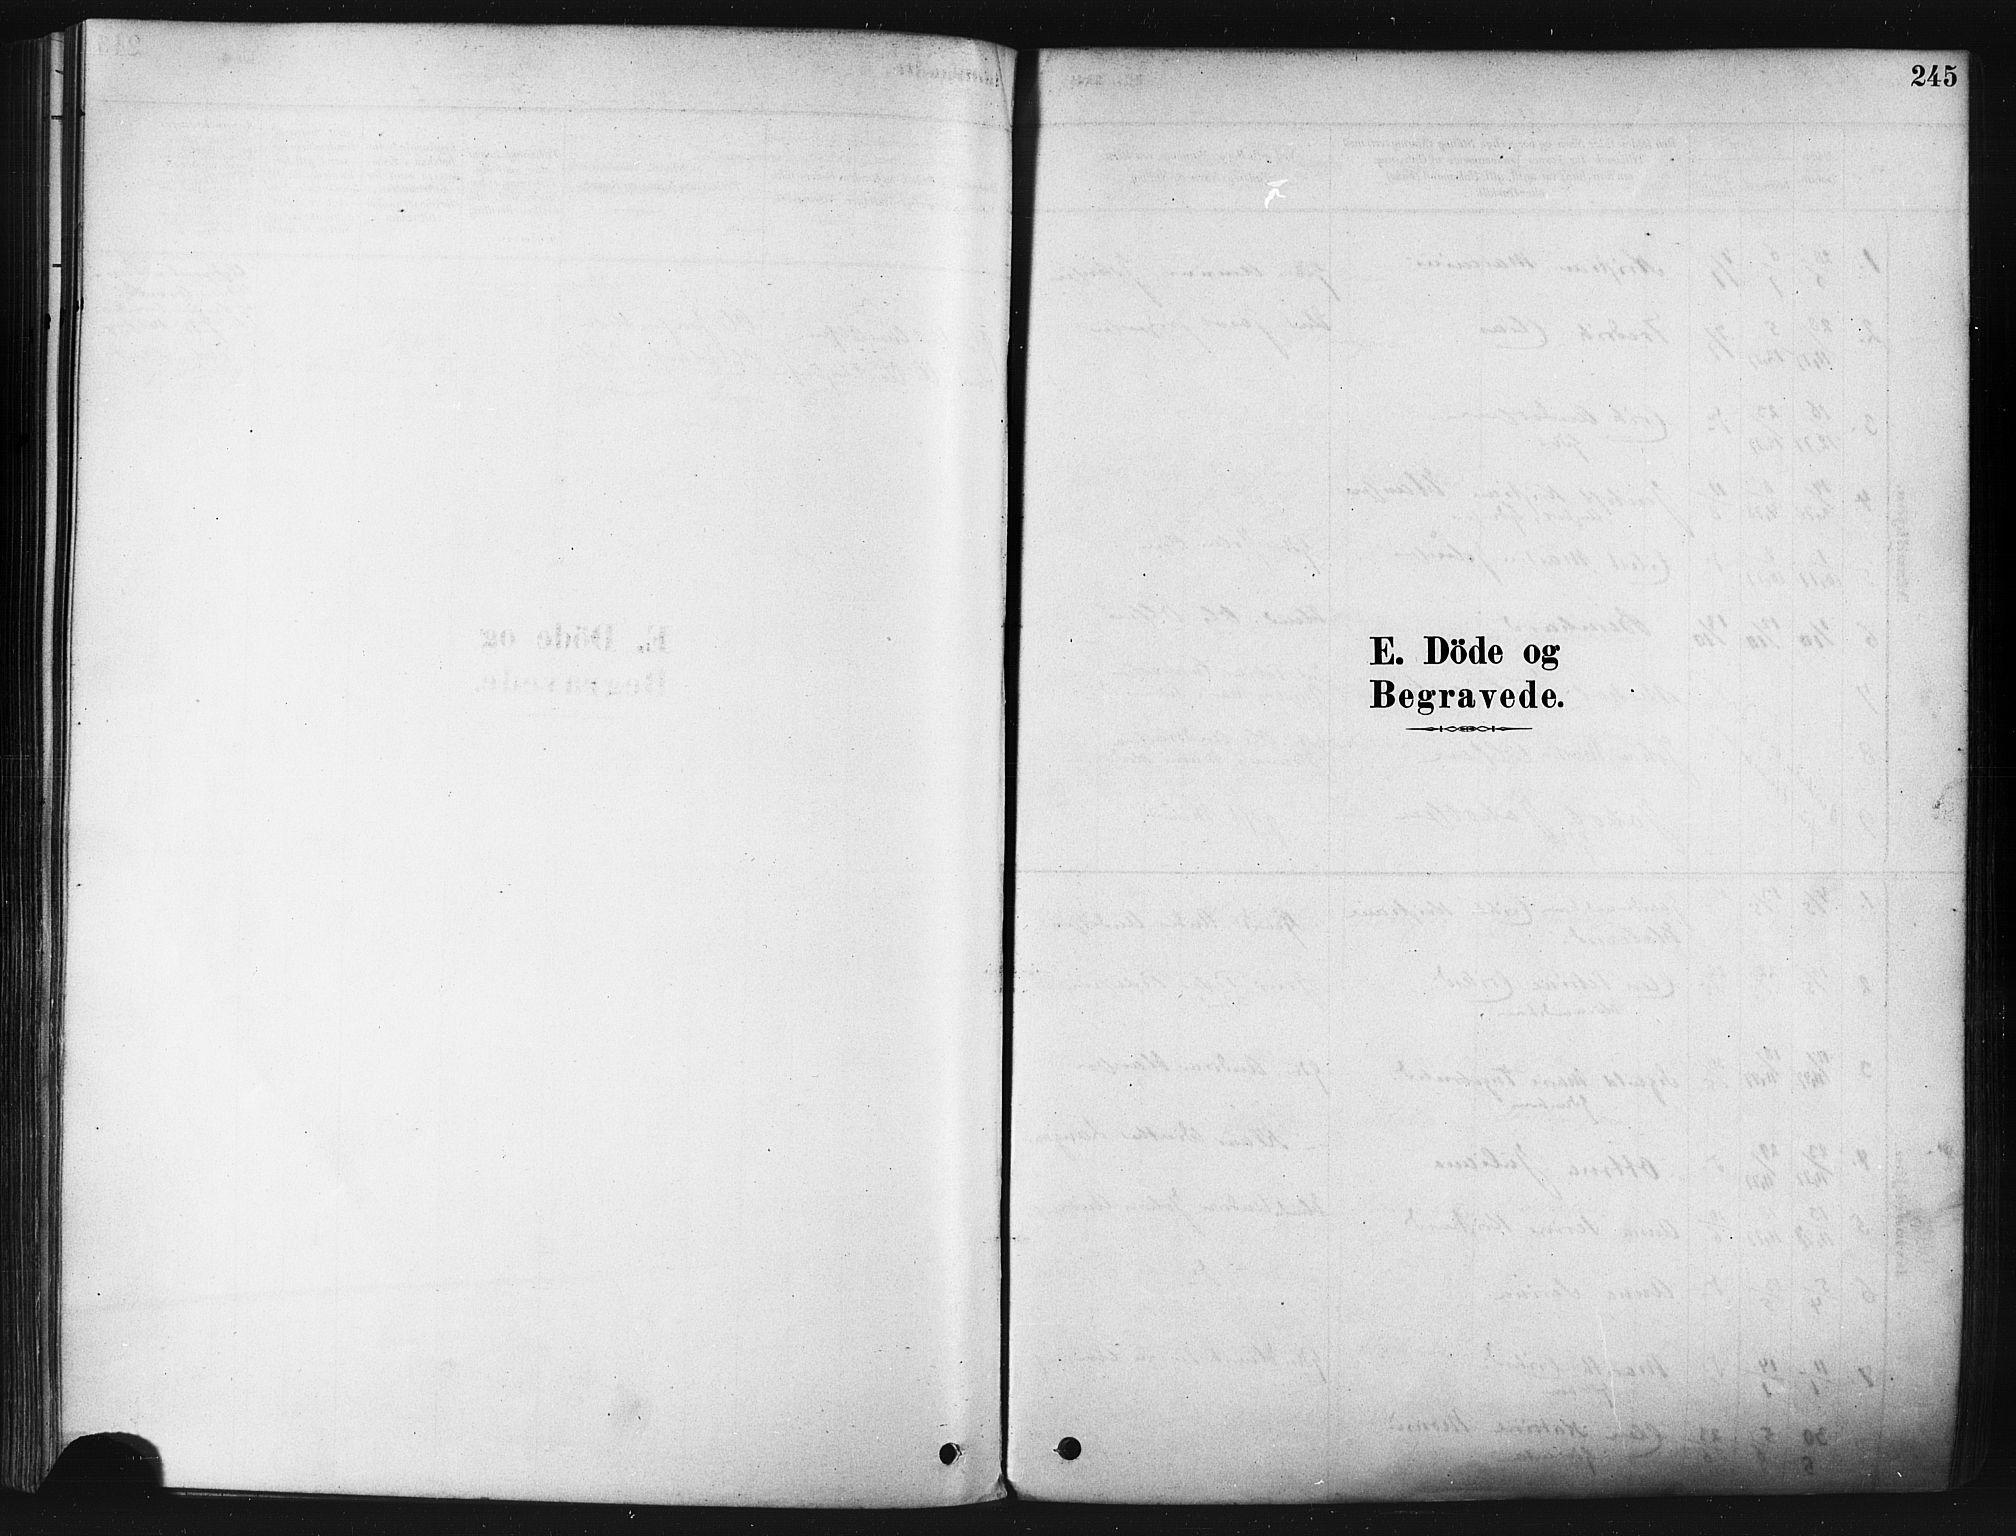 SATØ, Tranøy sokneprestkontor, I/Ia/Iaa/L0009kirke: Ministerialbok nr. 9, 1878-1904, s. 245